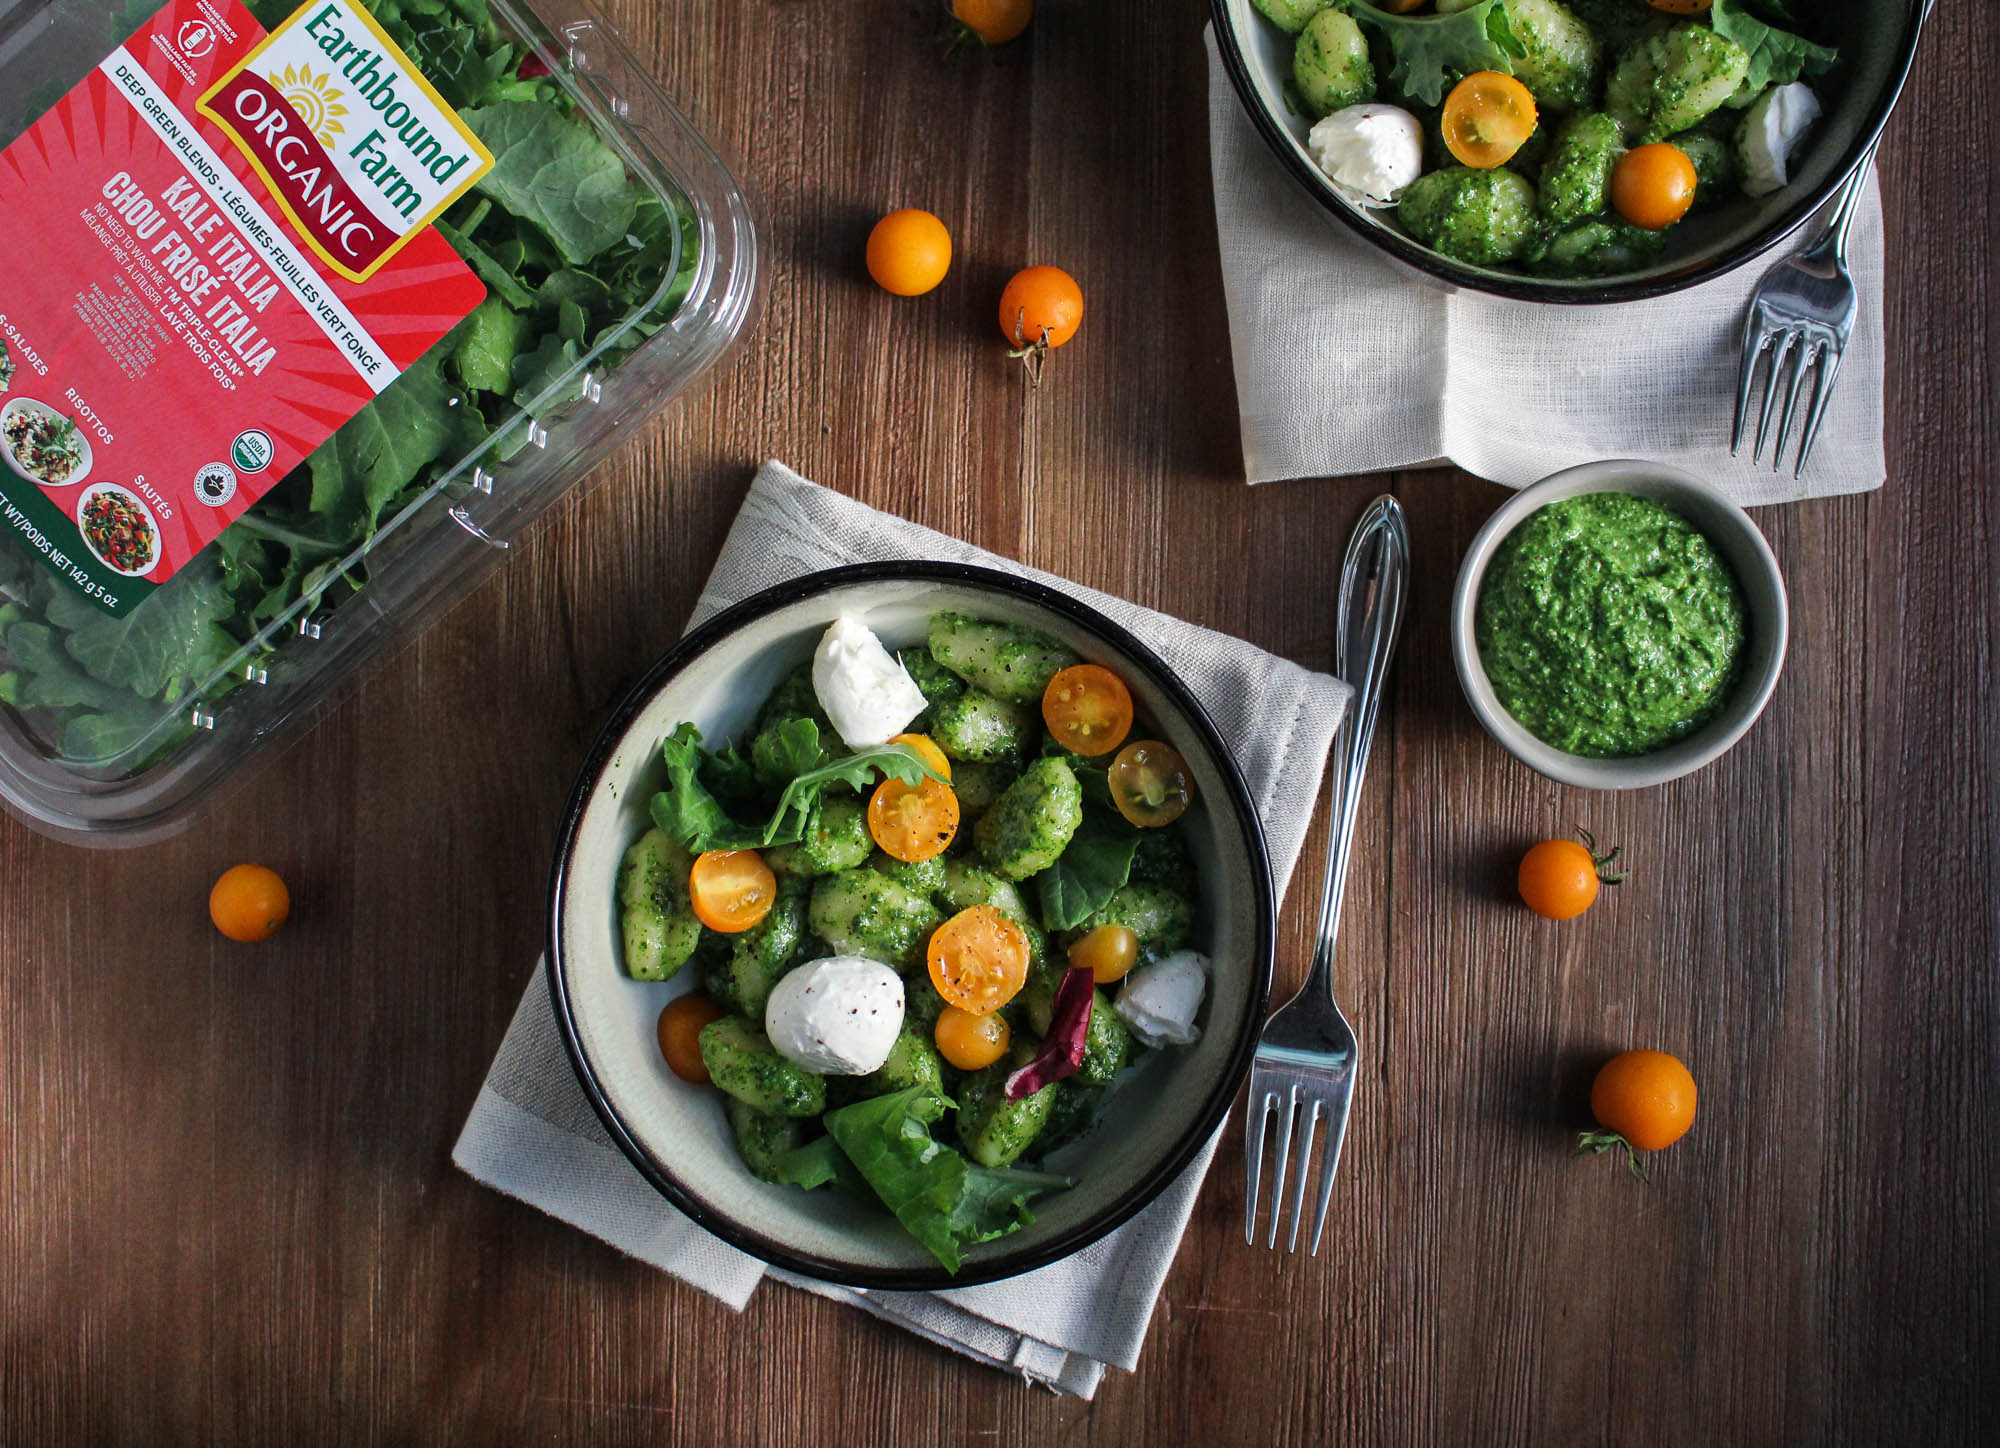 Kale Italia Pesto Gnocchi Katie At The Kitchen Door